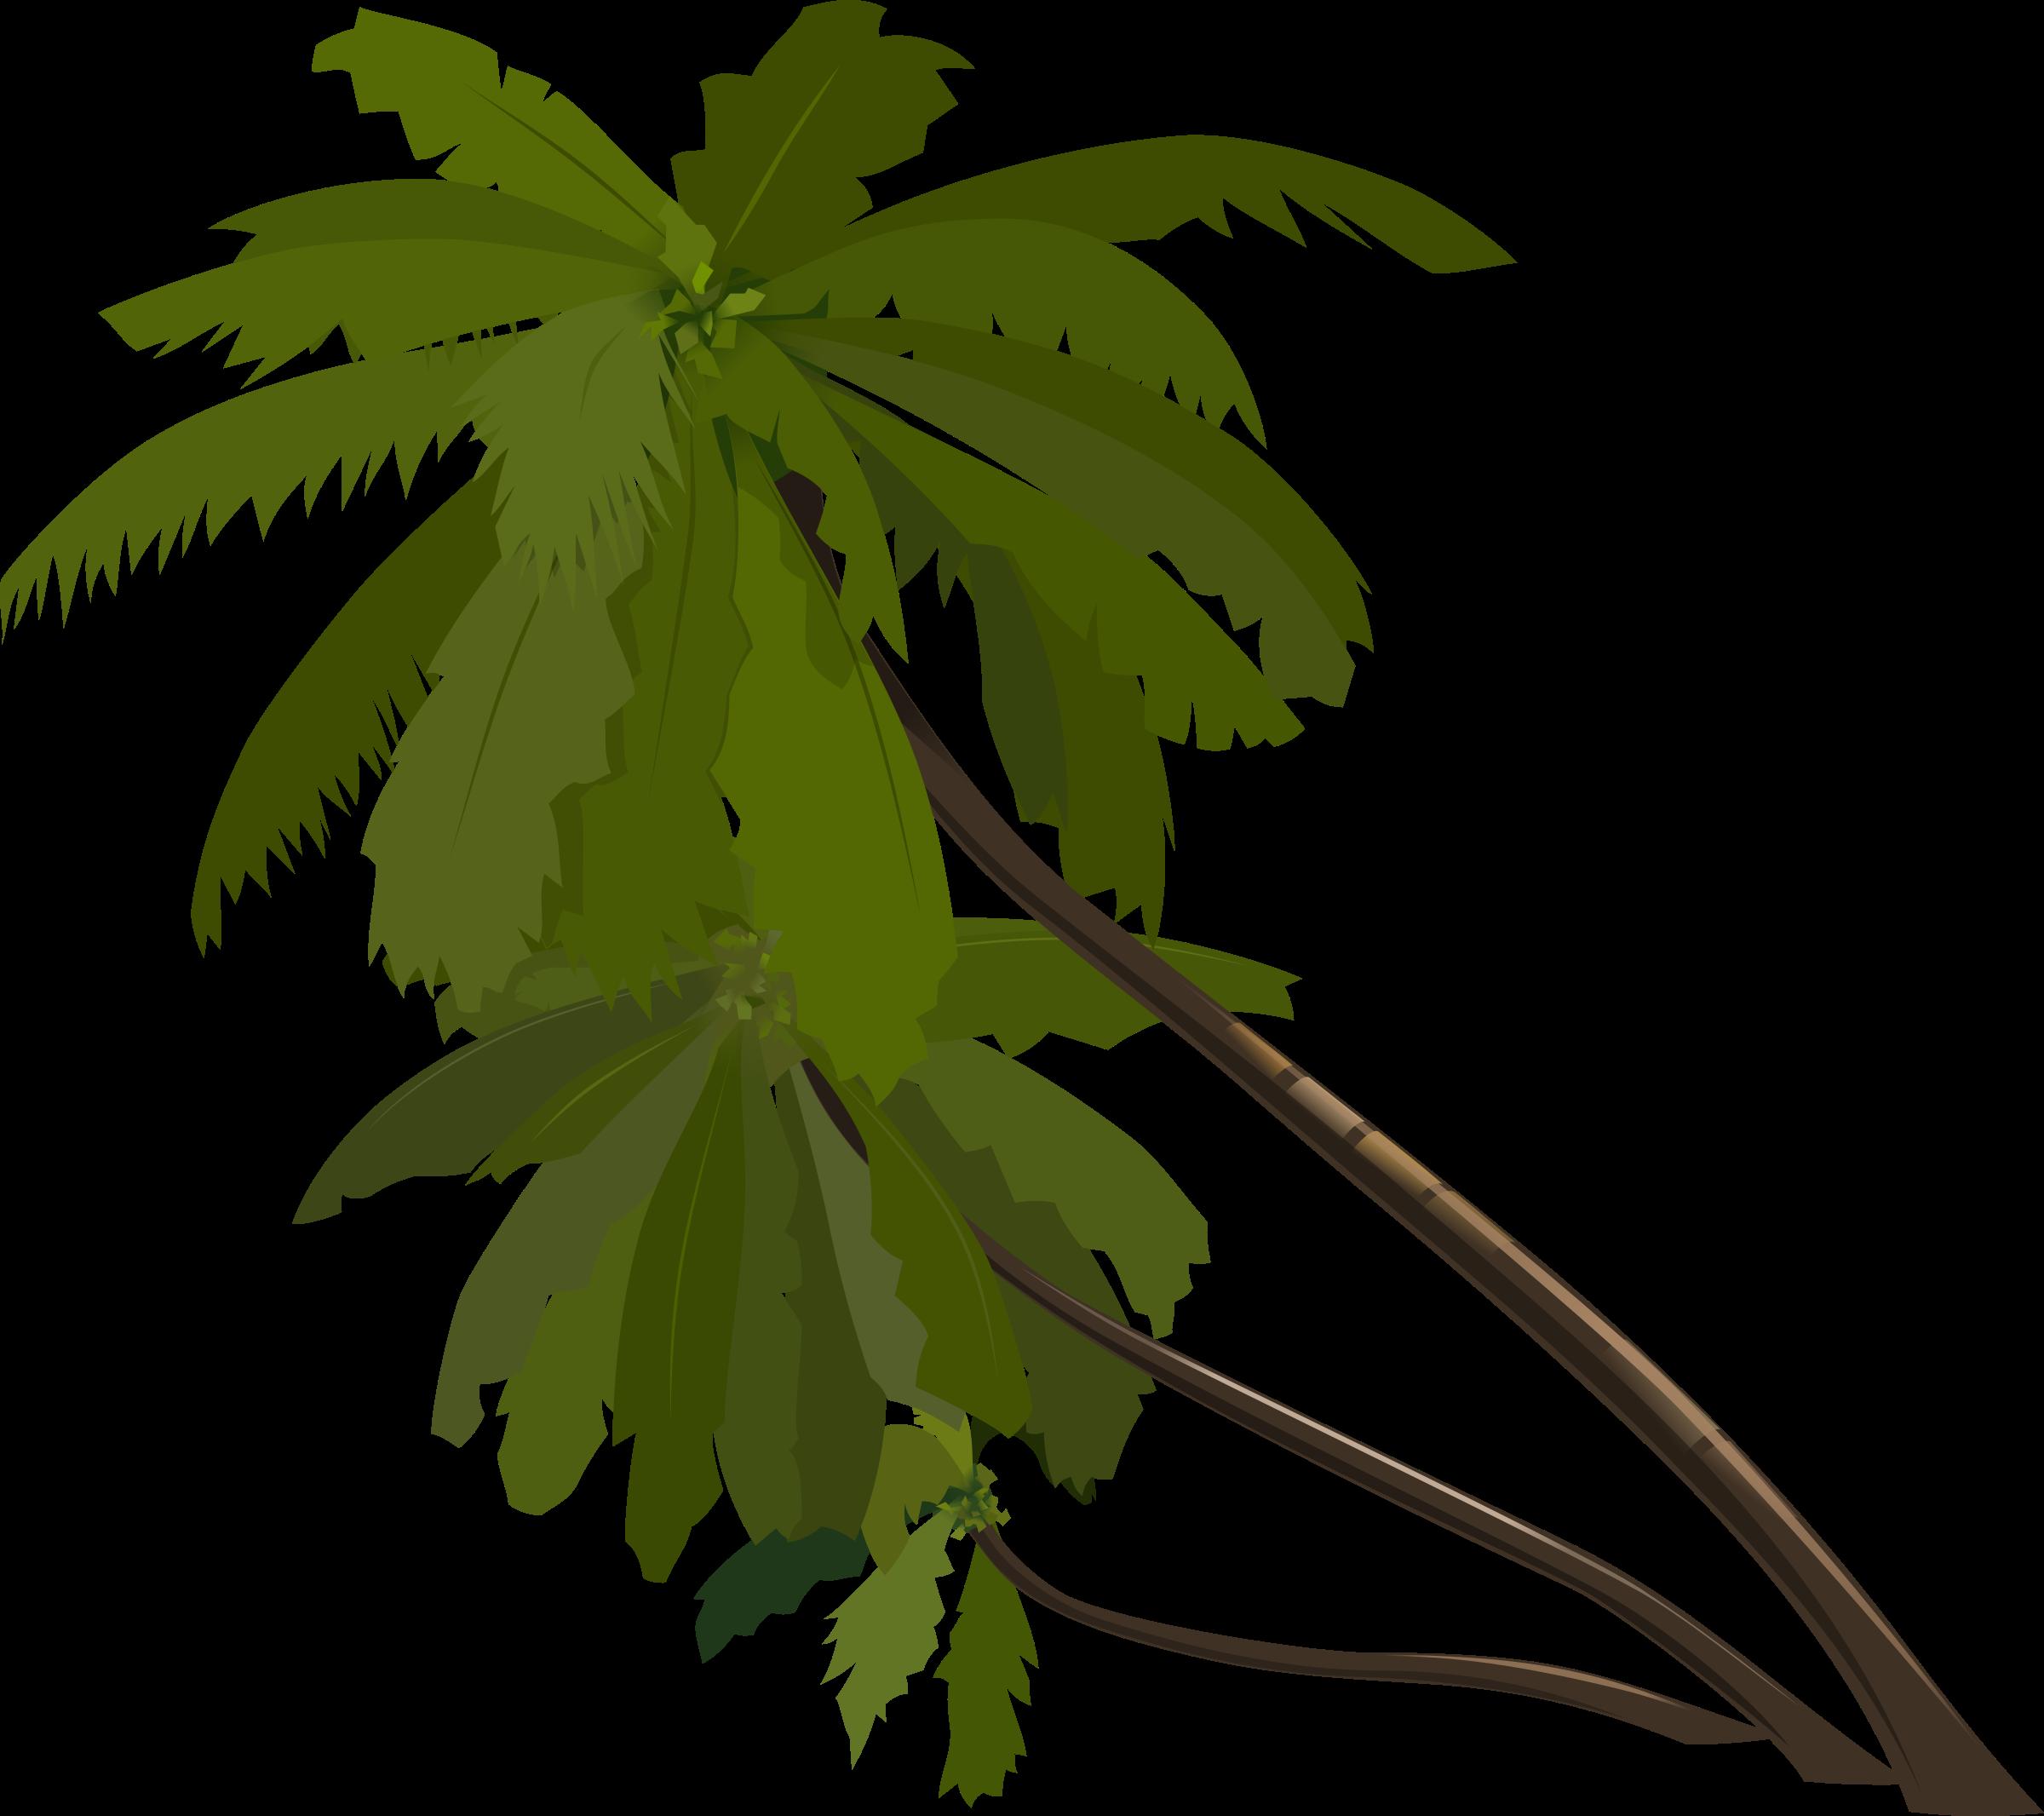 Palm trees big image. Clipart tree banana